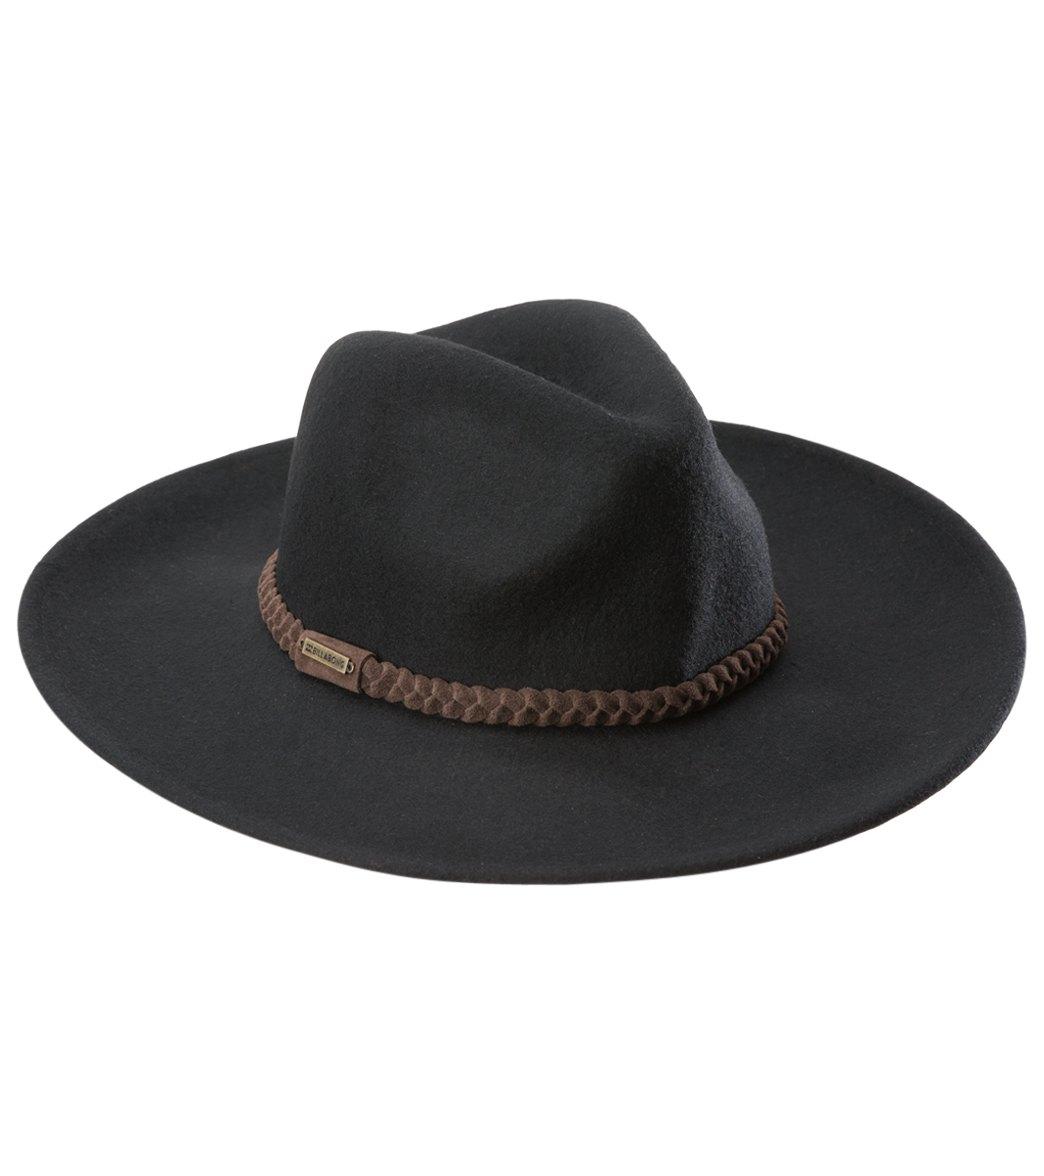 8878509f435bb9 Billabong Daydreamin Hat at SwimOutlet.com